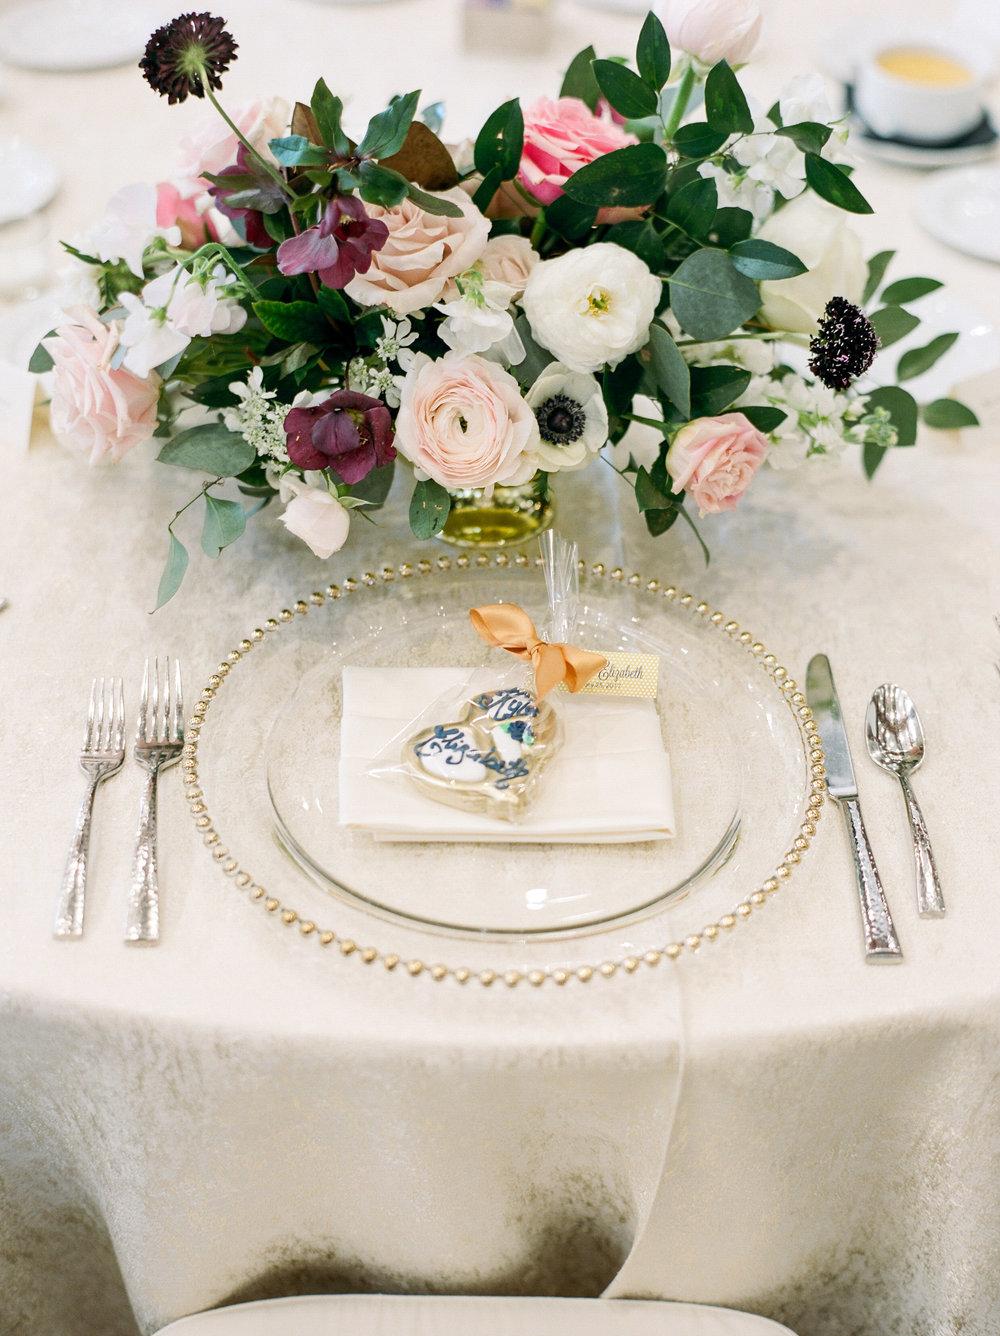 Houston-Wedding-Photographer-Style-Me-Pretty-St-Anne-Catholic-Church-Wedding-The-Woodlands-Country-Club-Palmer-Course-Austin-Wedding-photographer-fine-art-film-25.jpg